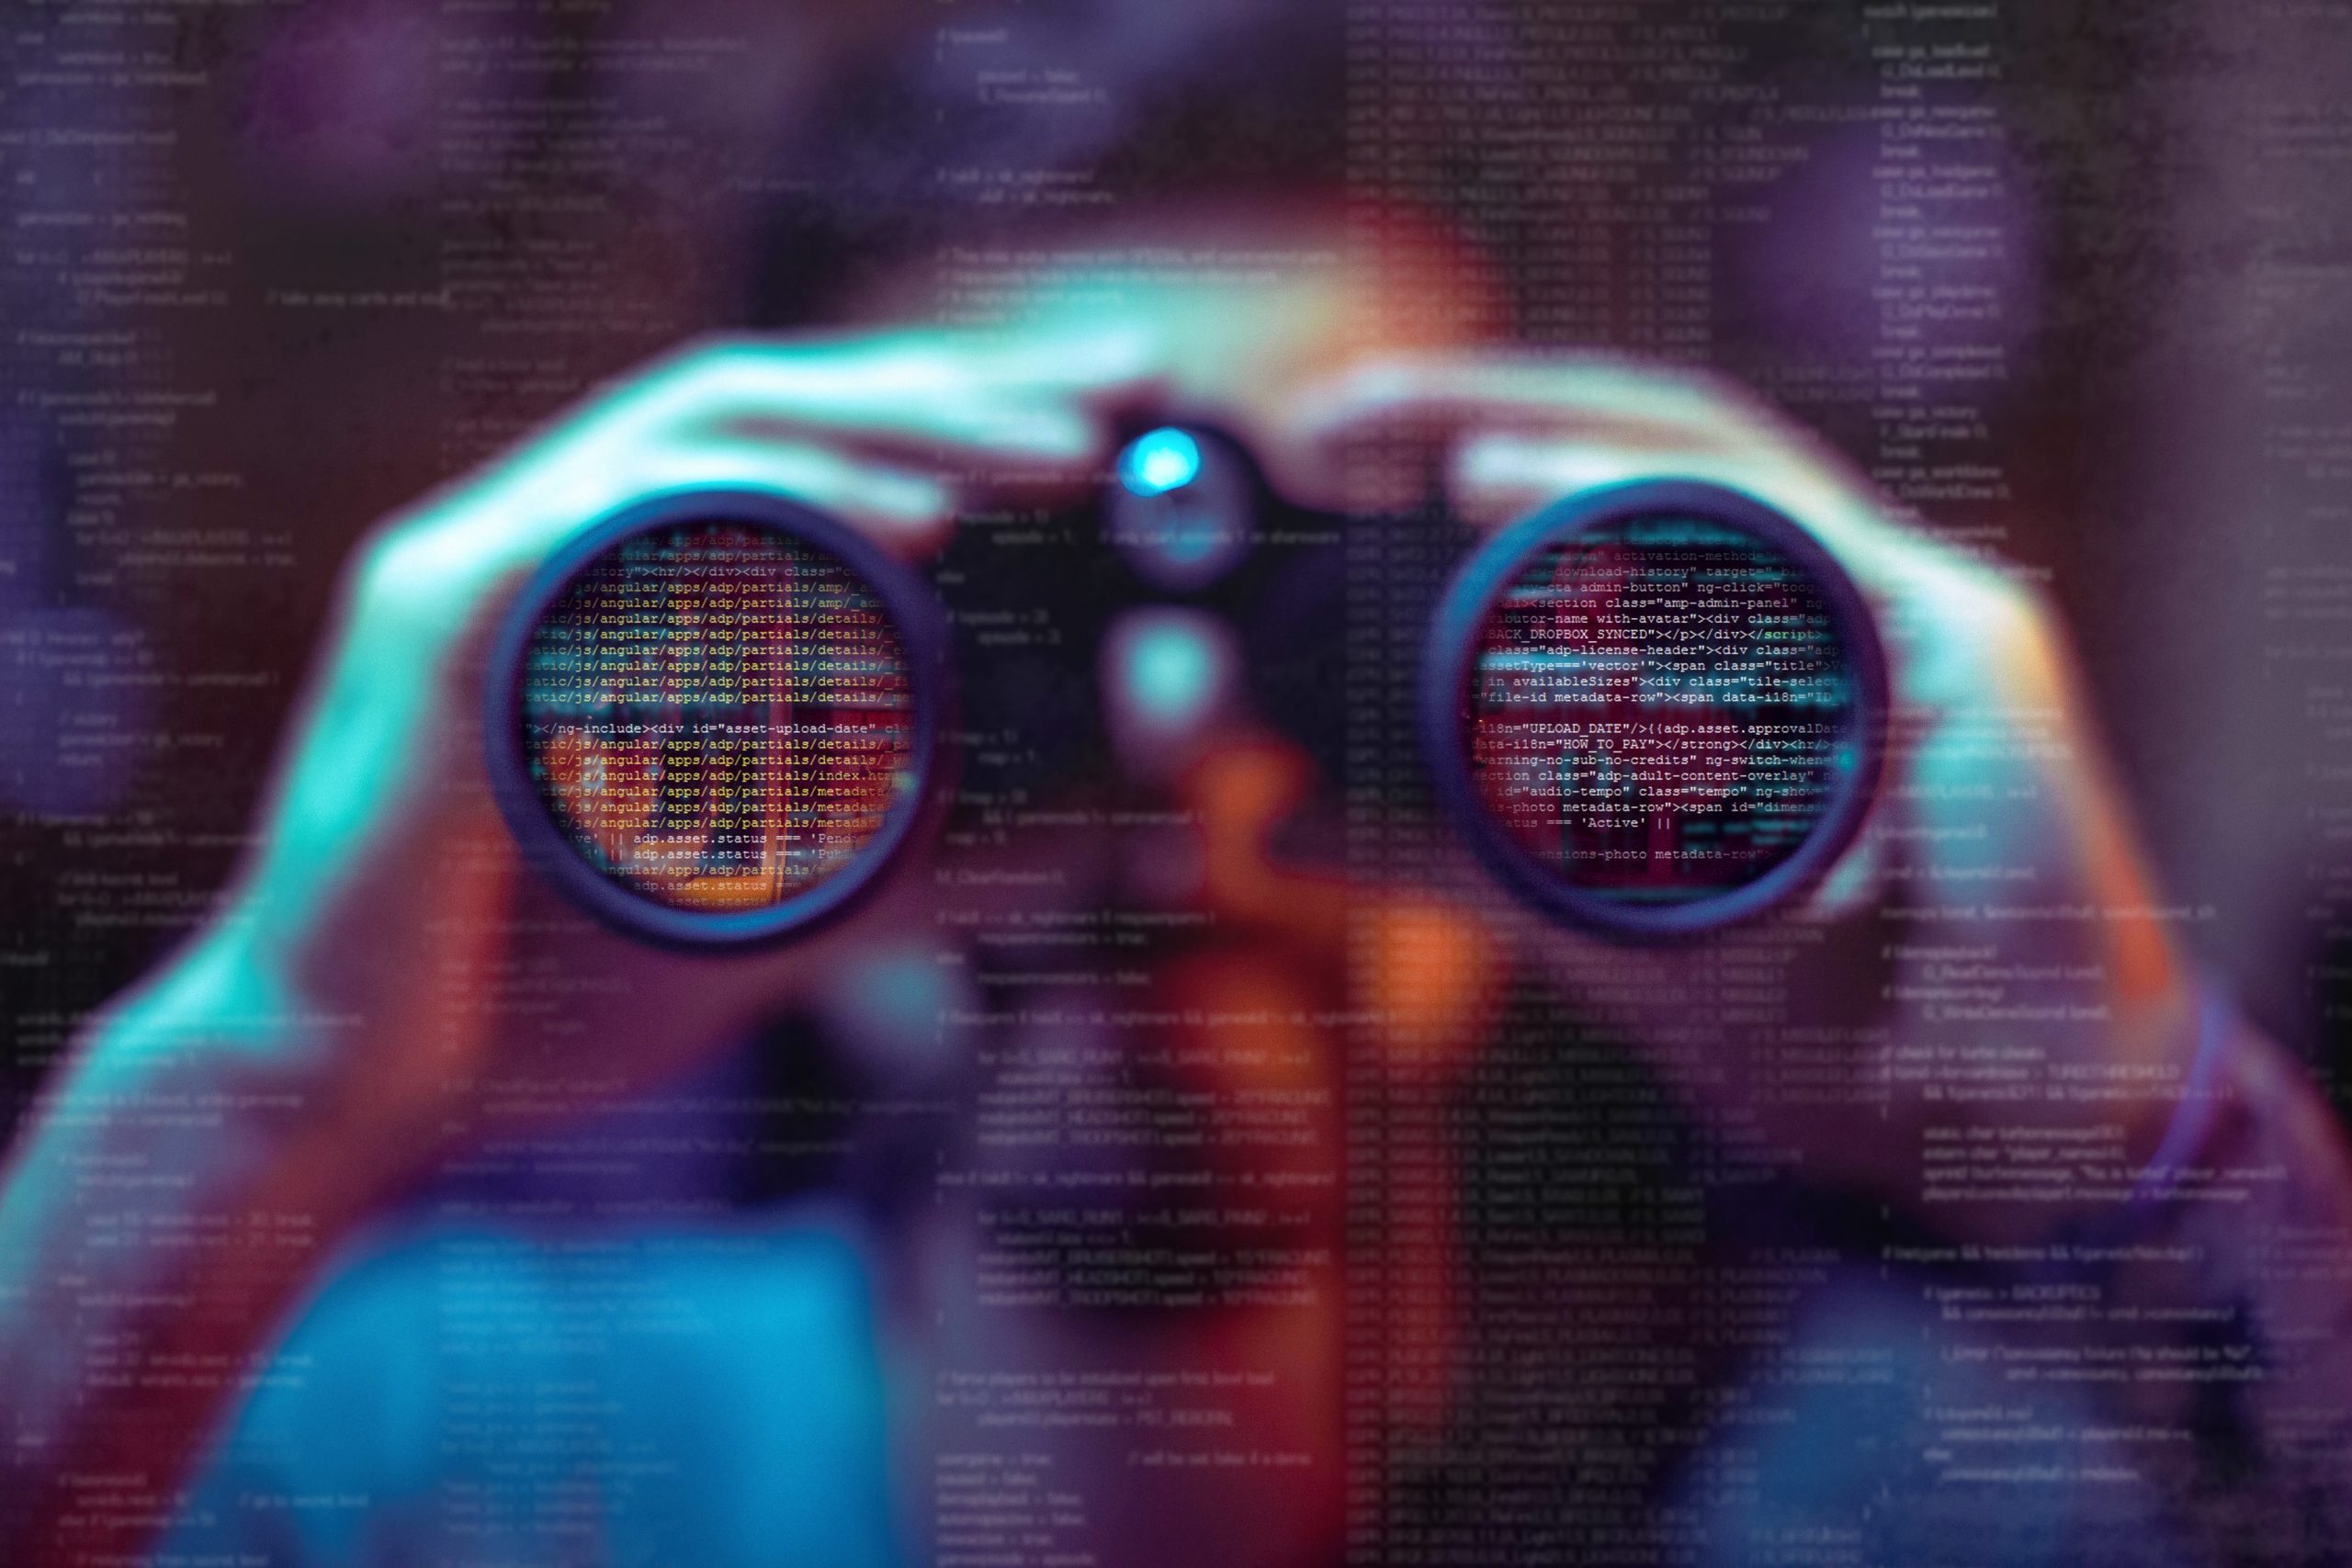 A man looking through binoculars, indicating remote CCTV surveillance